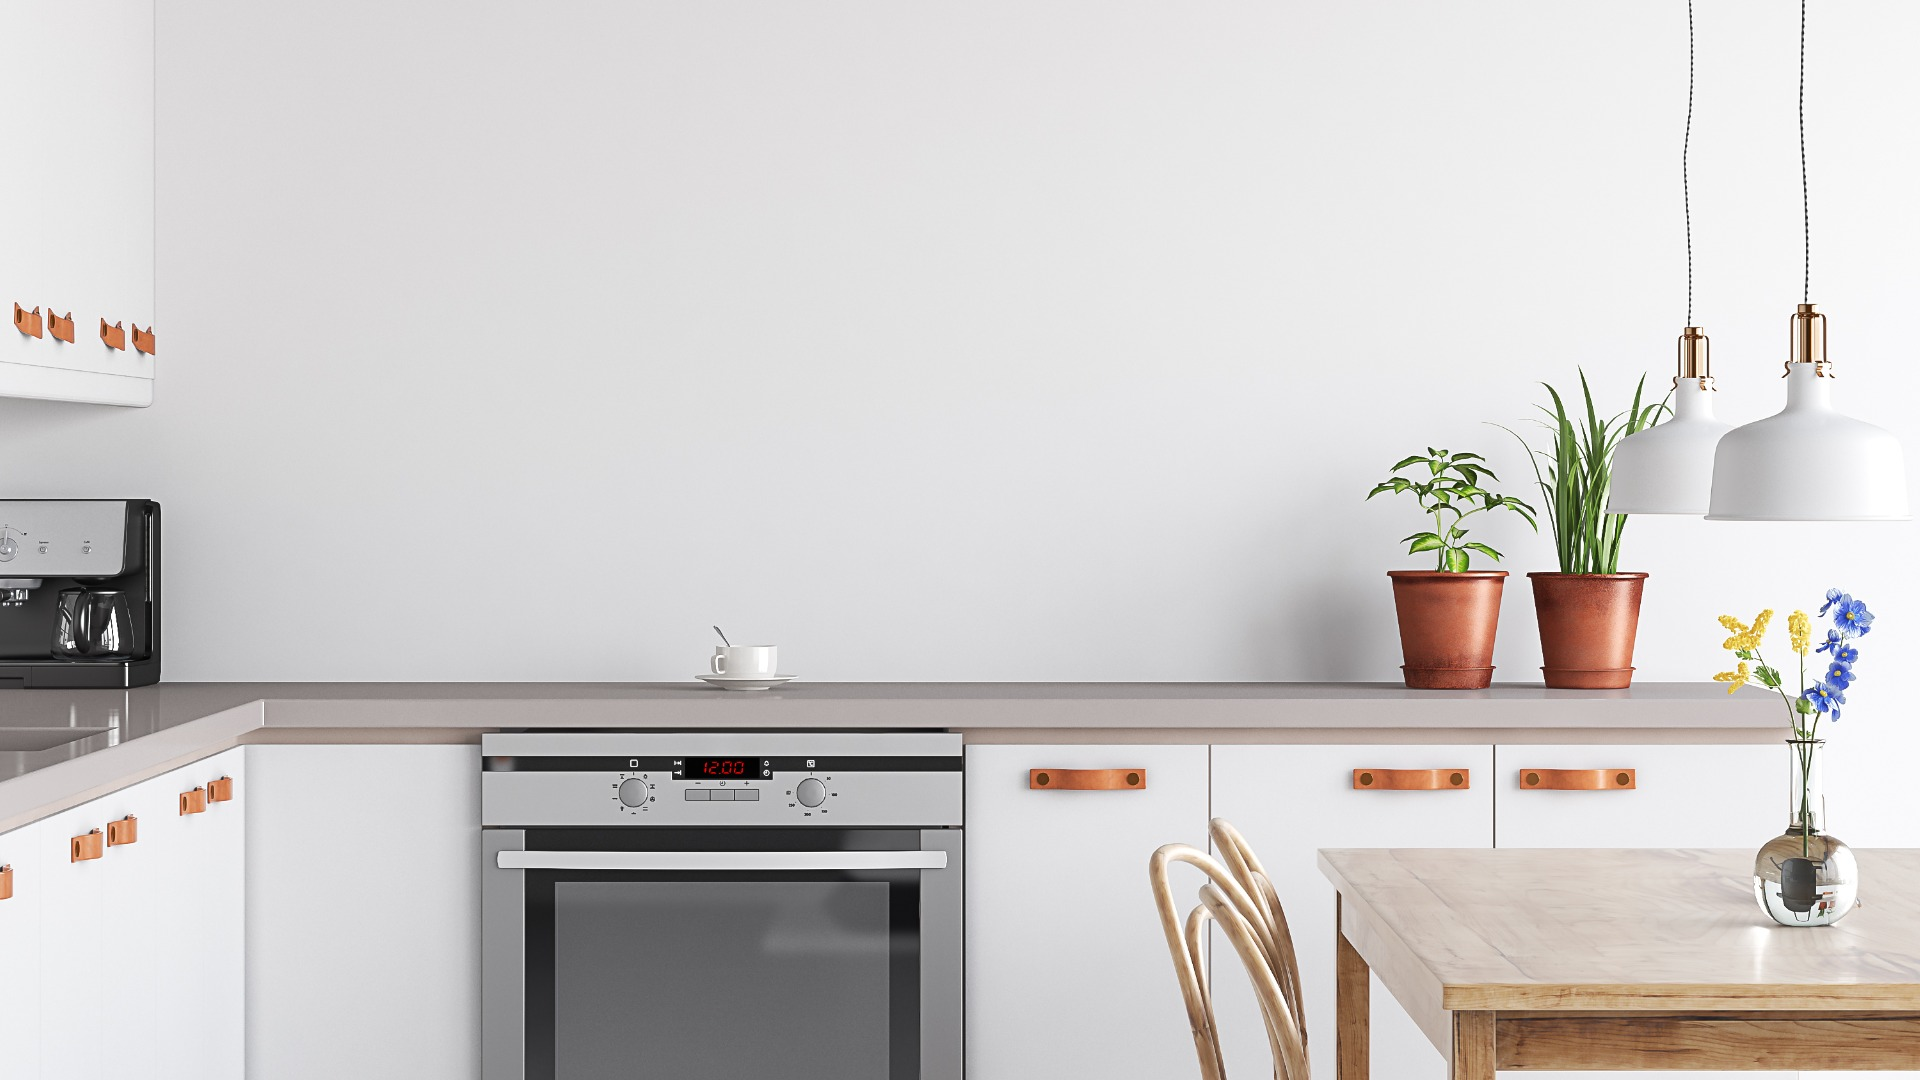 Peinture d'une cuisine